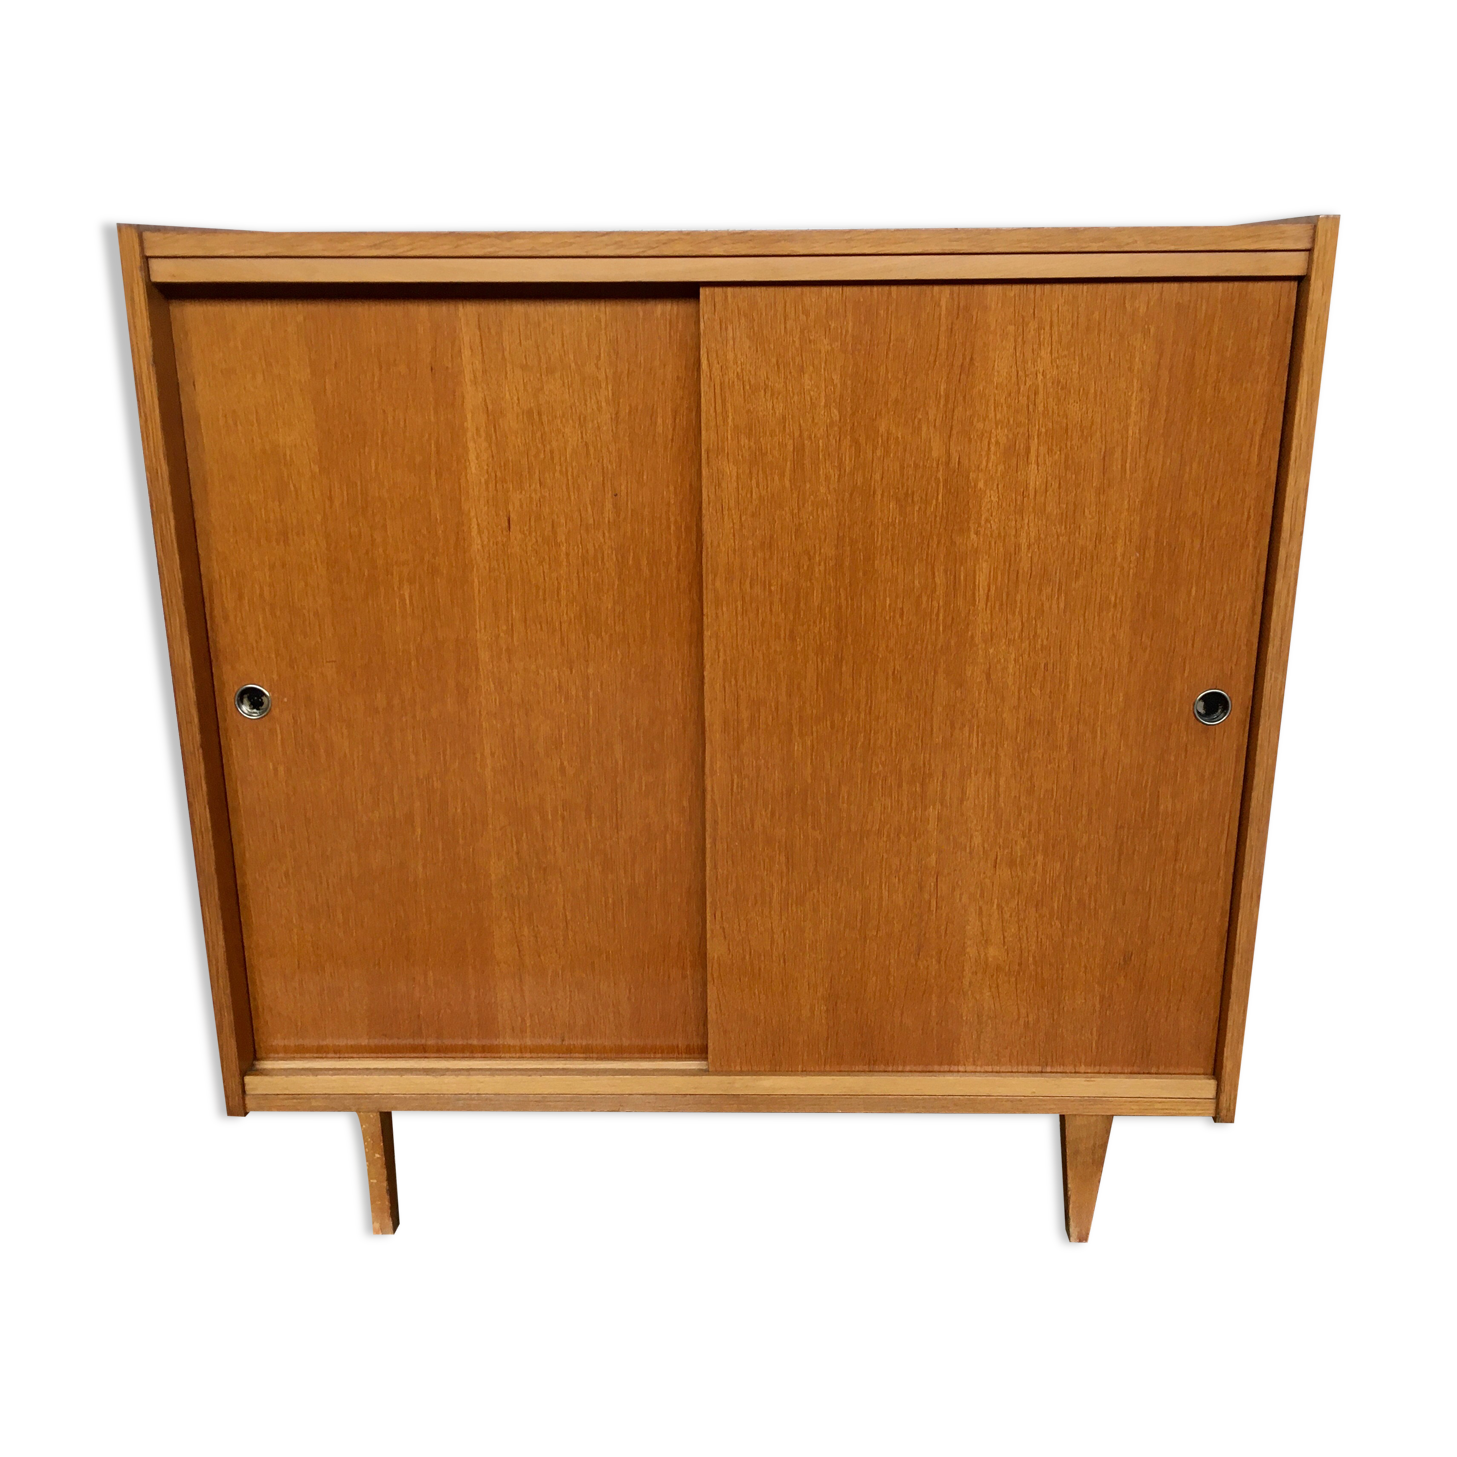 Enfilade bahut meuble tv / hifi vintage - 50/60 - style scandinave